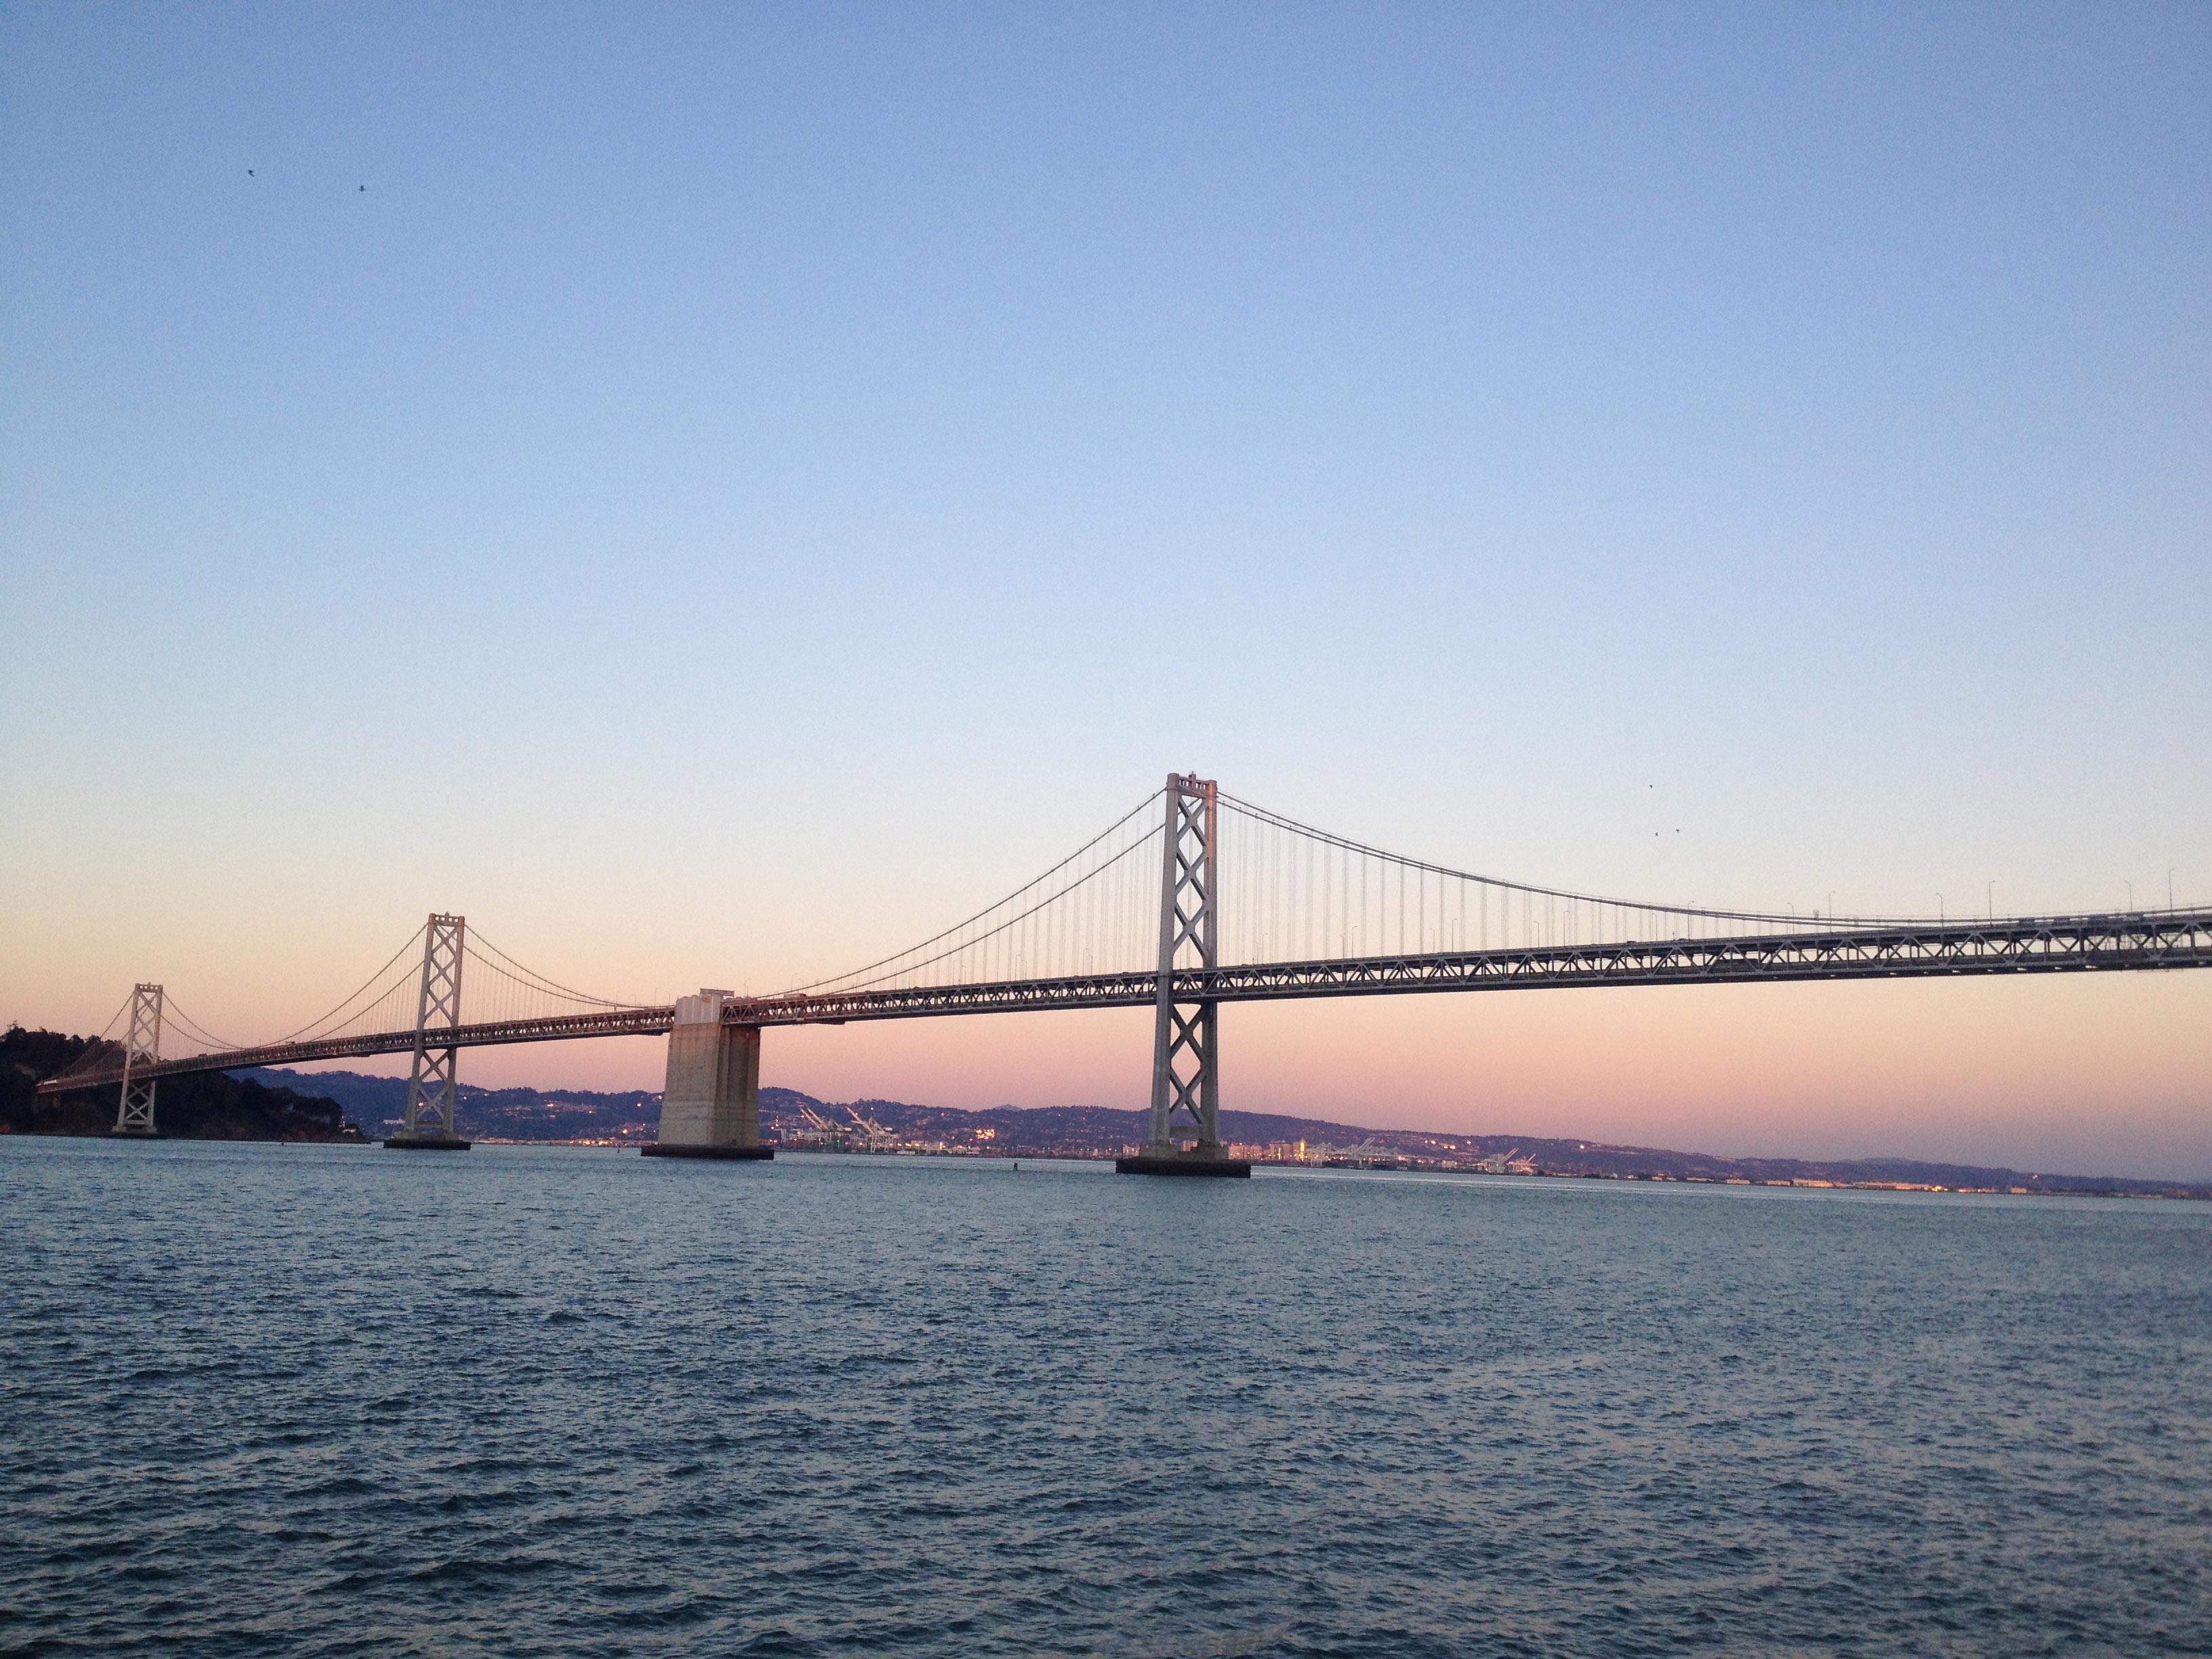 San Francisco bridal public relations agency